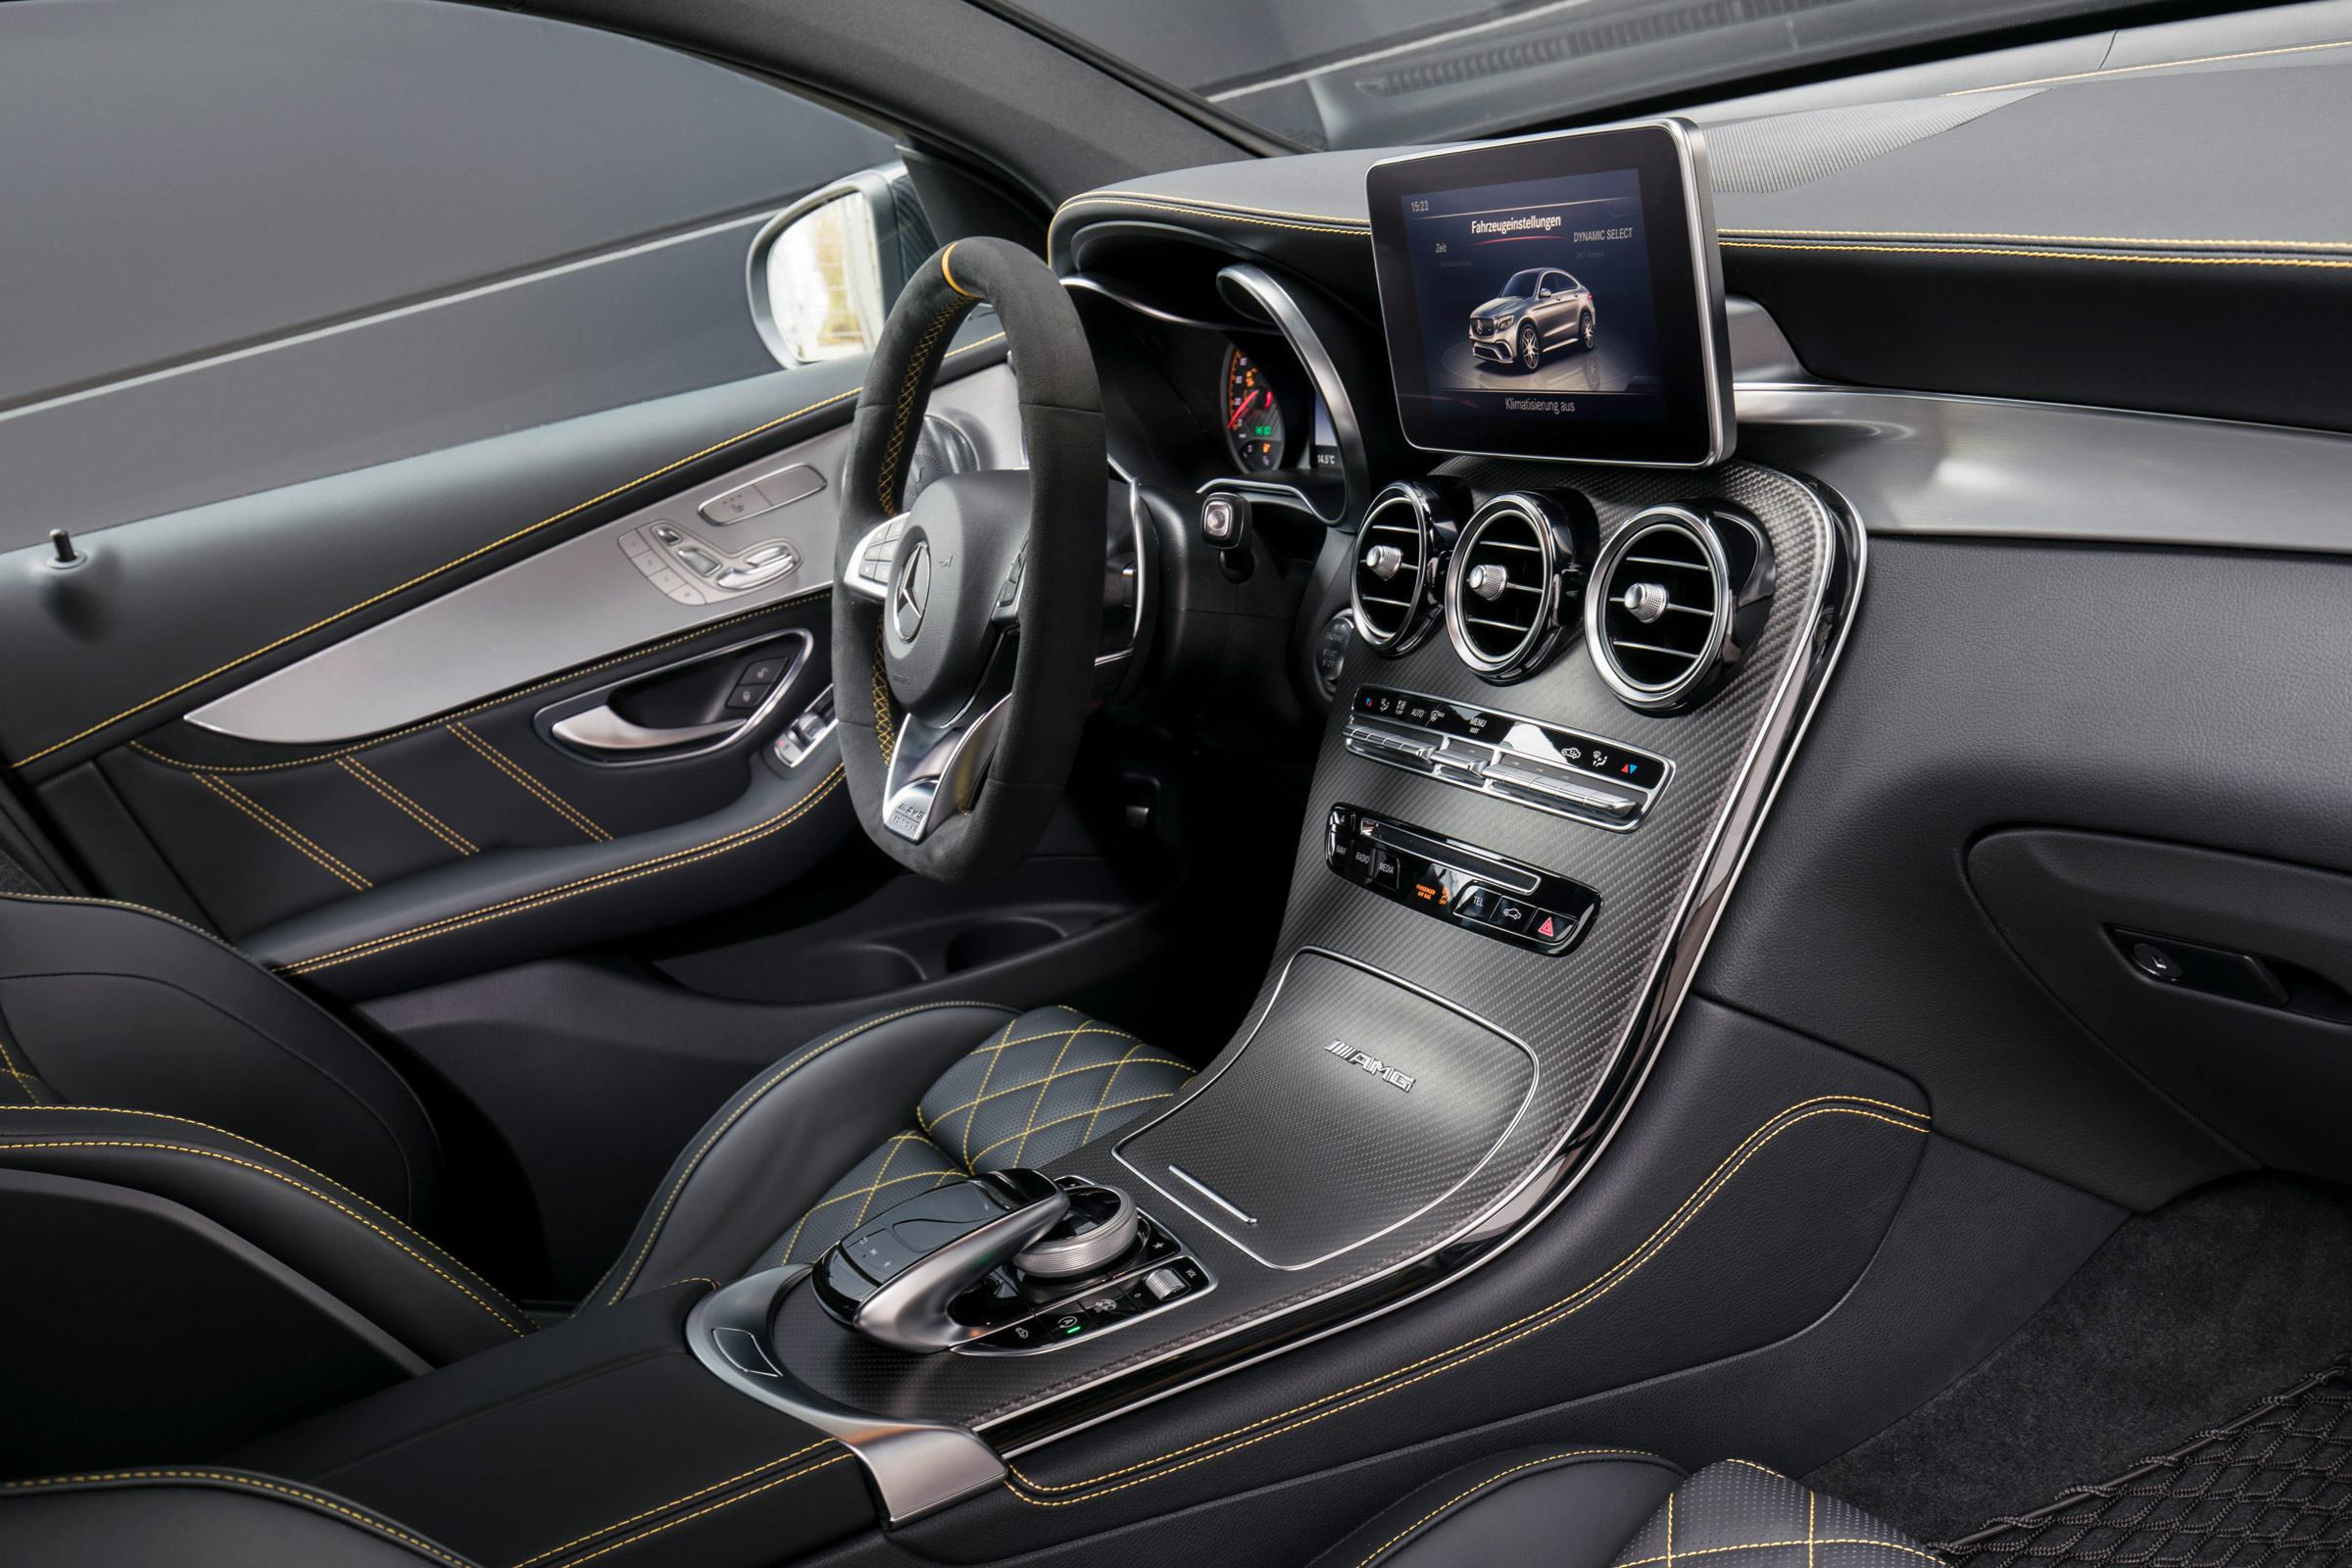 Mercedes-AMG 63 S